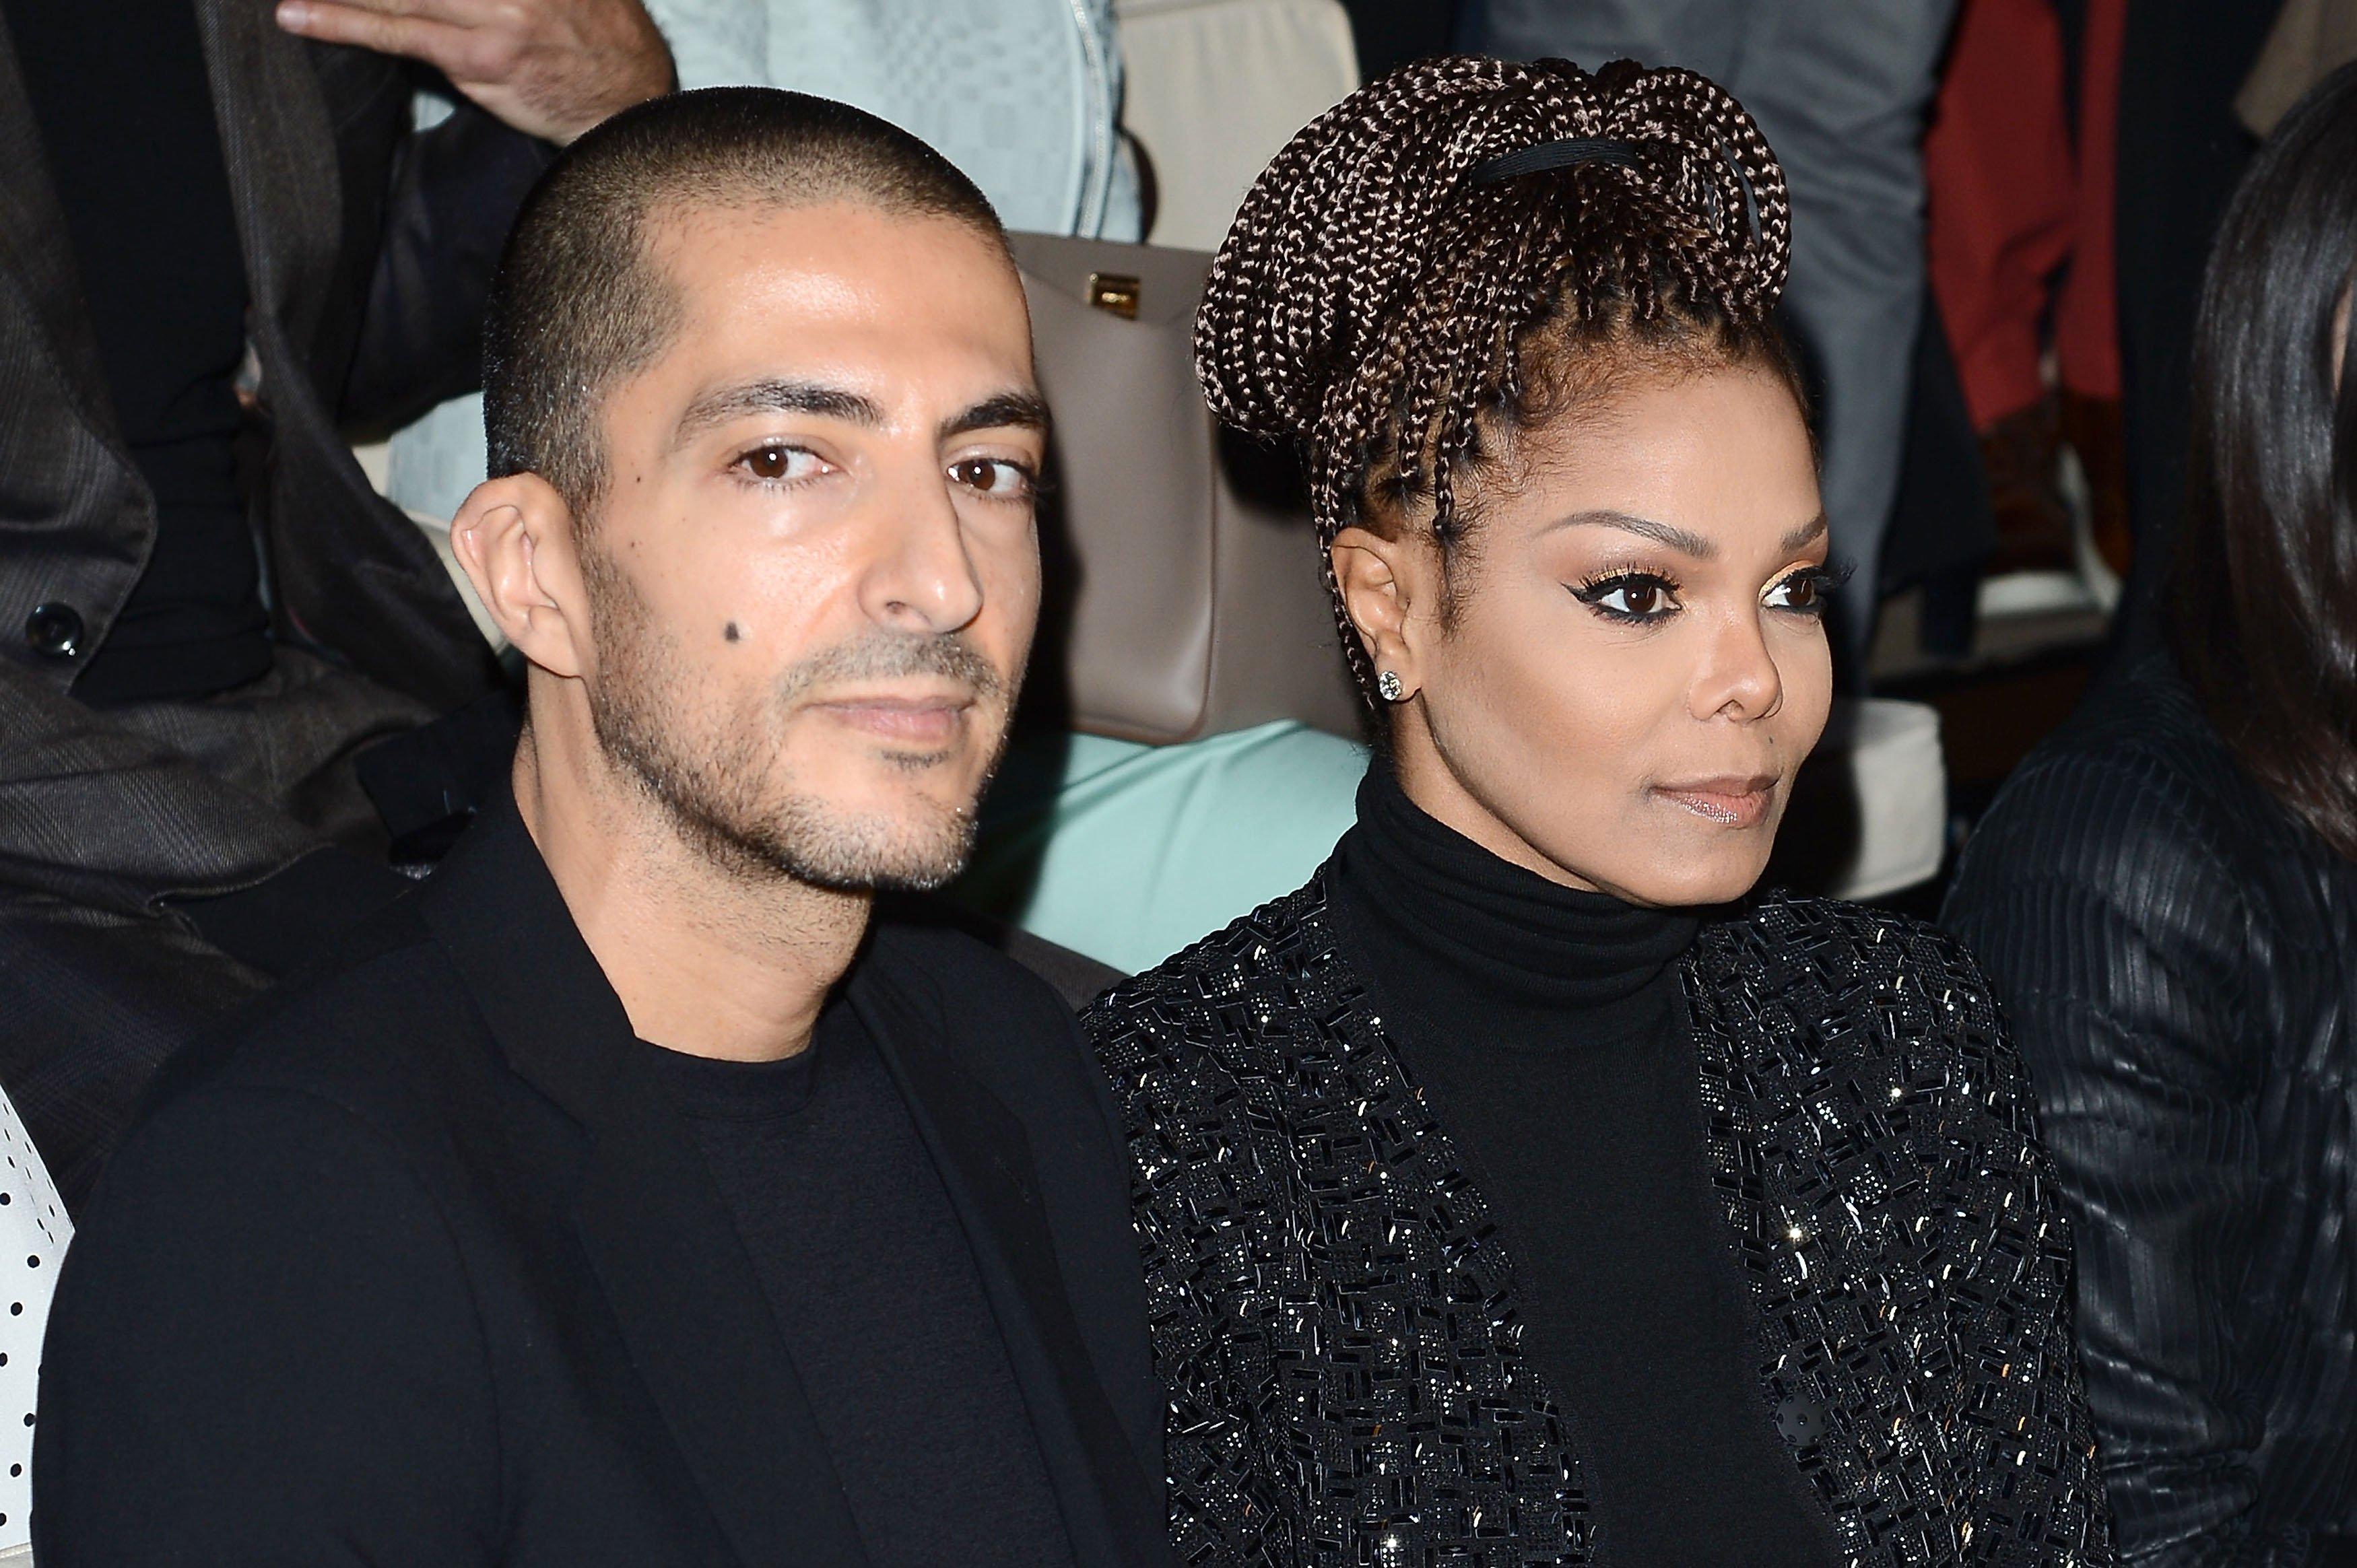 Wissam al Mana and Janet Jackson attend the Giorgio Armani fashion show during Milan Fashion Week Womenswear Fall/Winter 2013/14 on February 25, 2013 in Milan